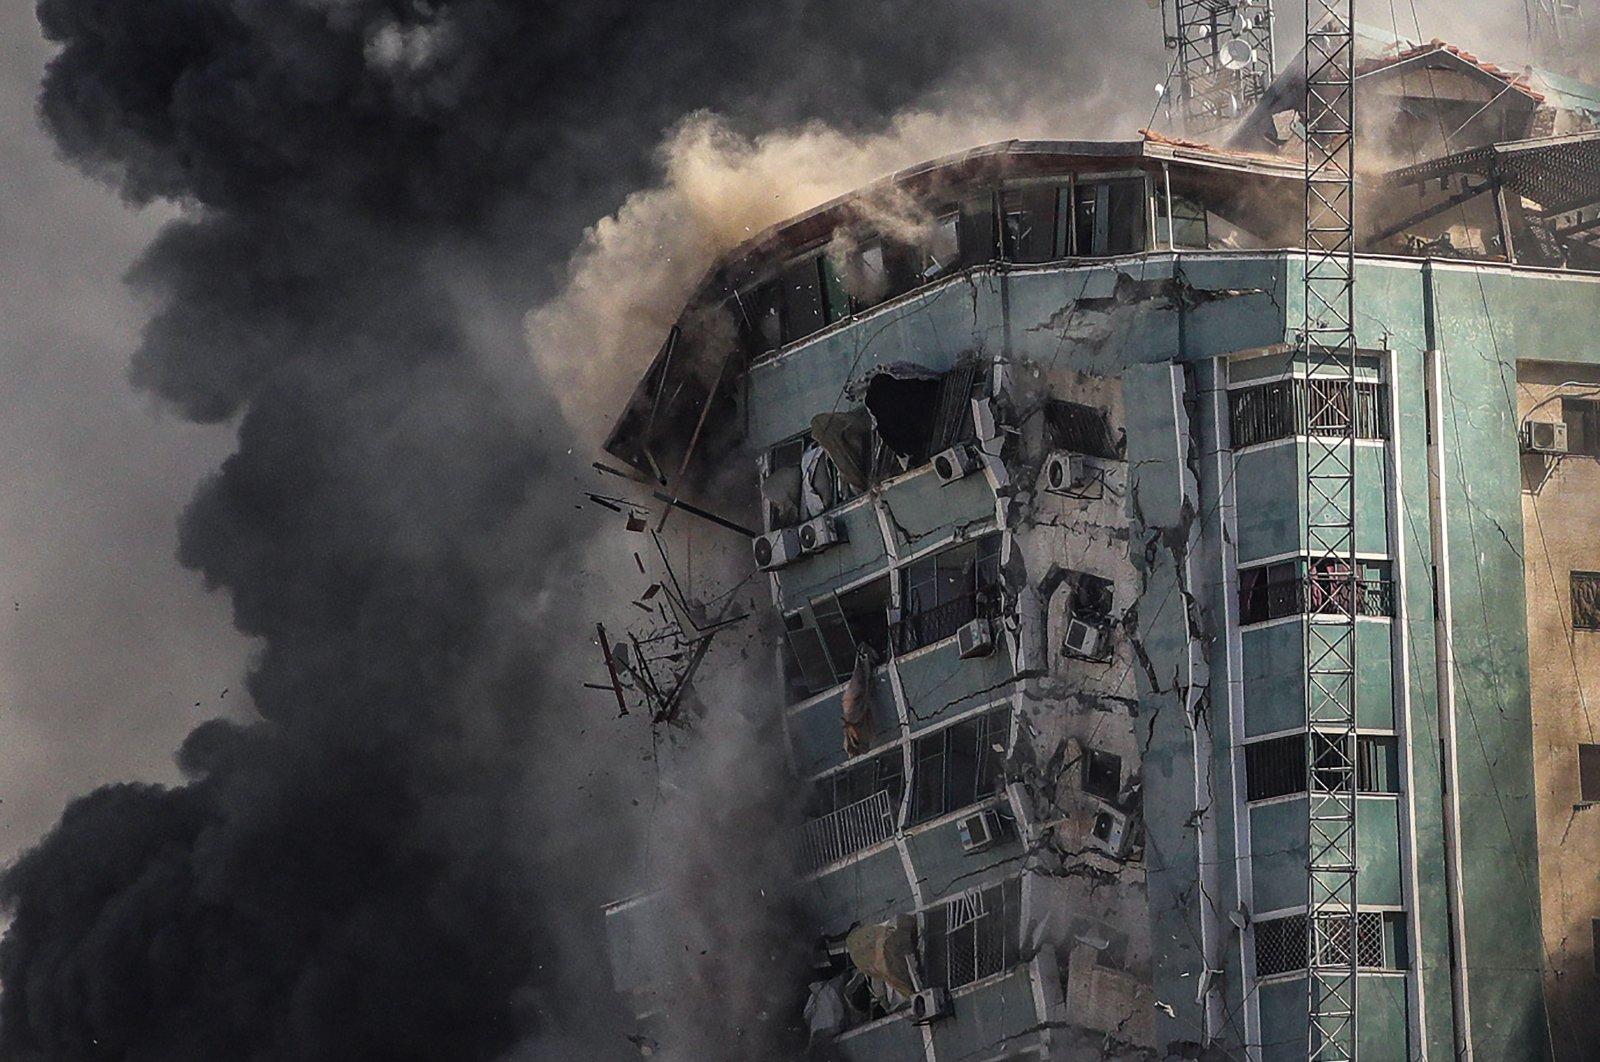 Turkey condemns Israel's destruction of media building in Gaza